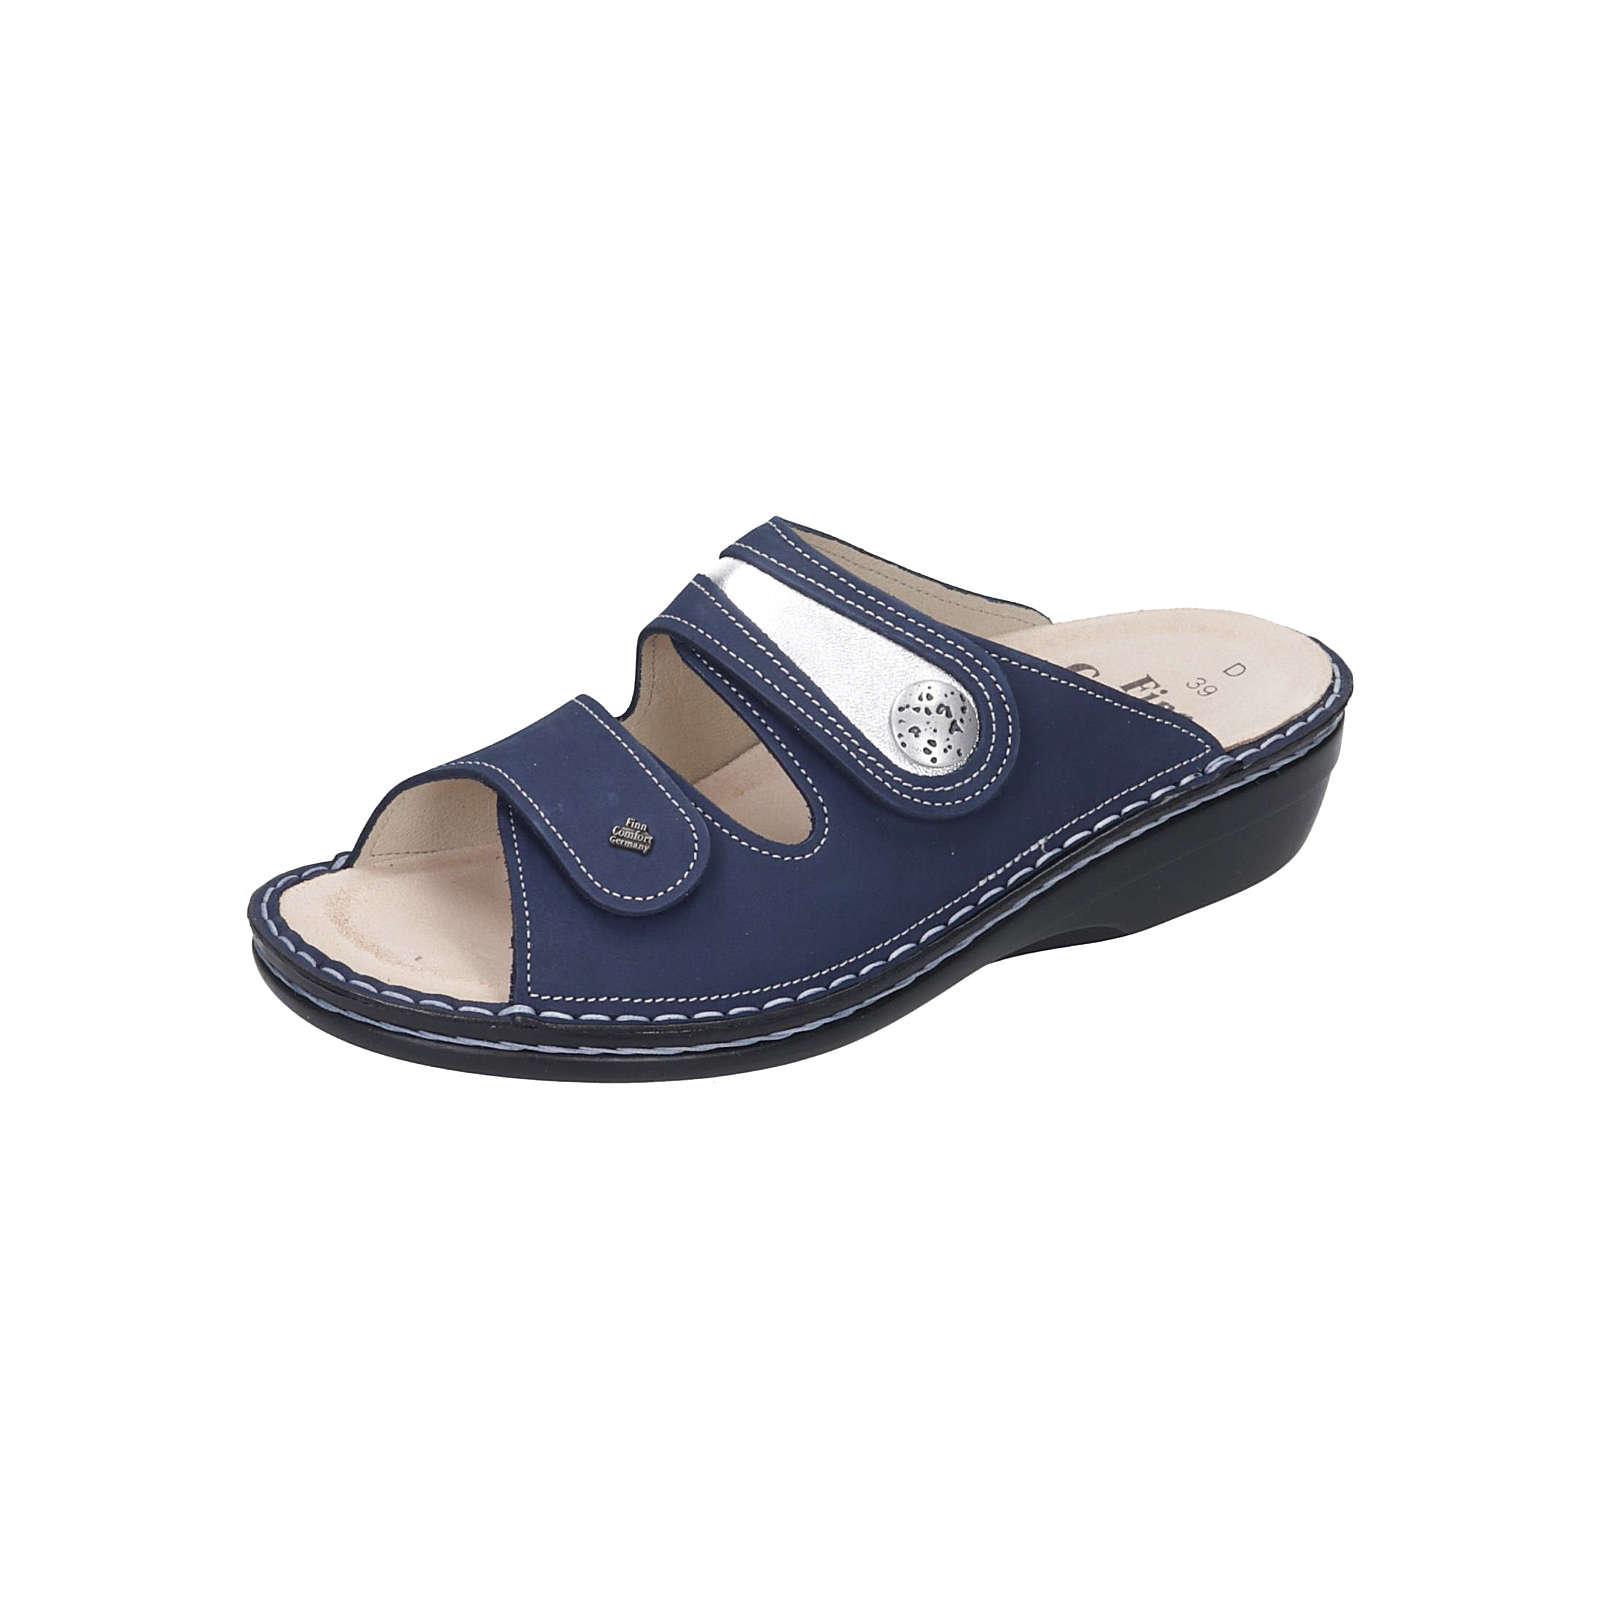 Finn Comfort Damen-Pantolette Komfort-Pantoletten blau Damen Gr. 39